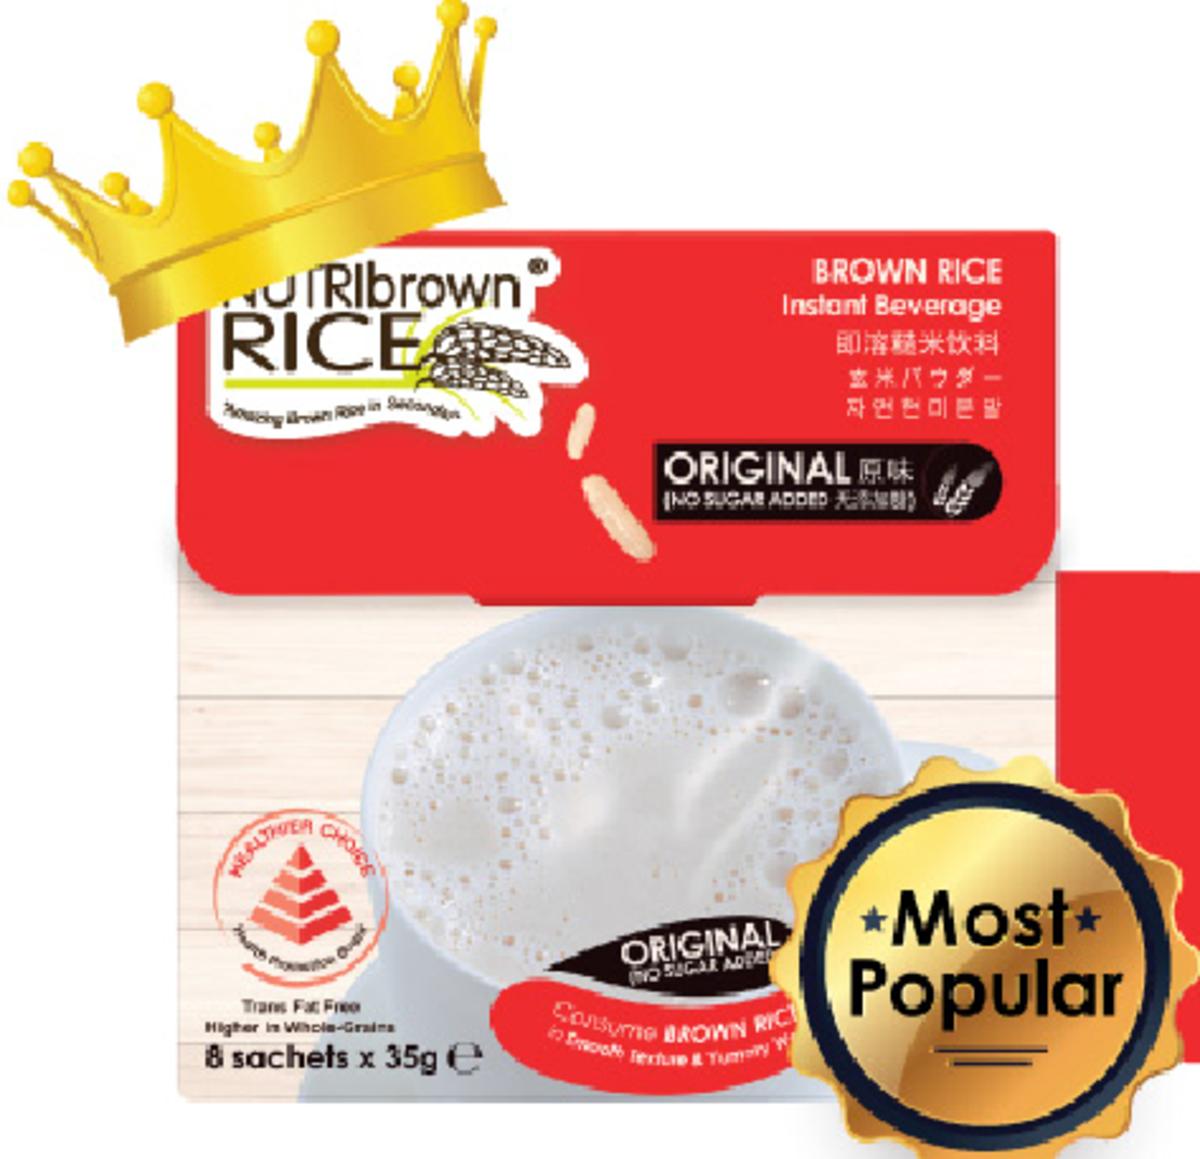 NBR 即溶糙米  (原味/無糖)  35g x 8包 含菊粉和益生菌